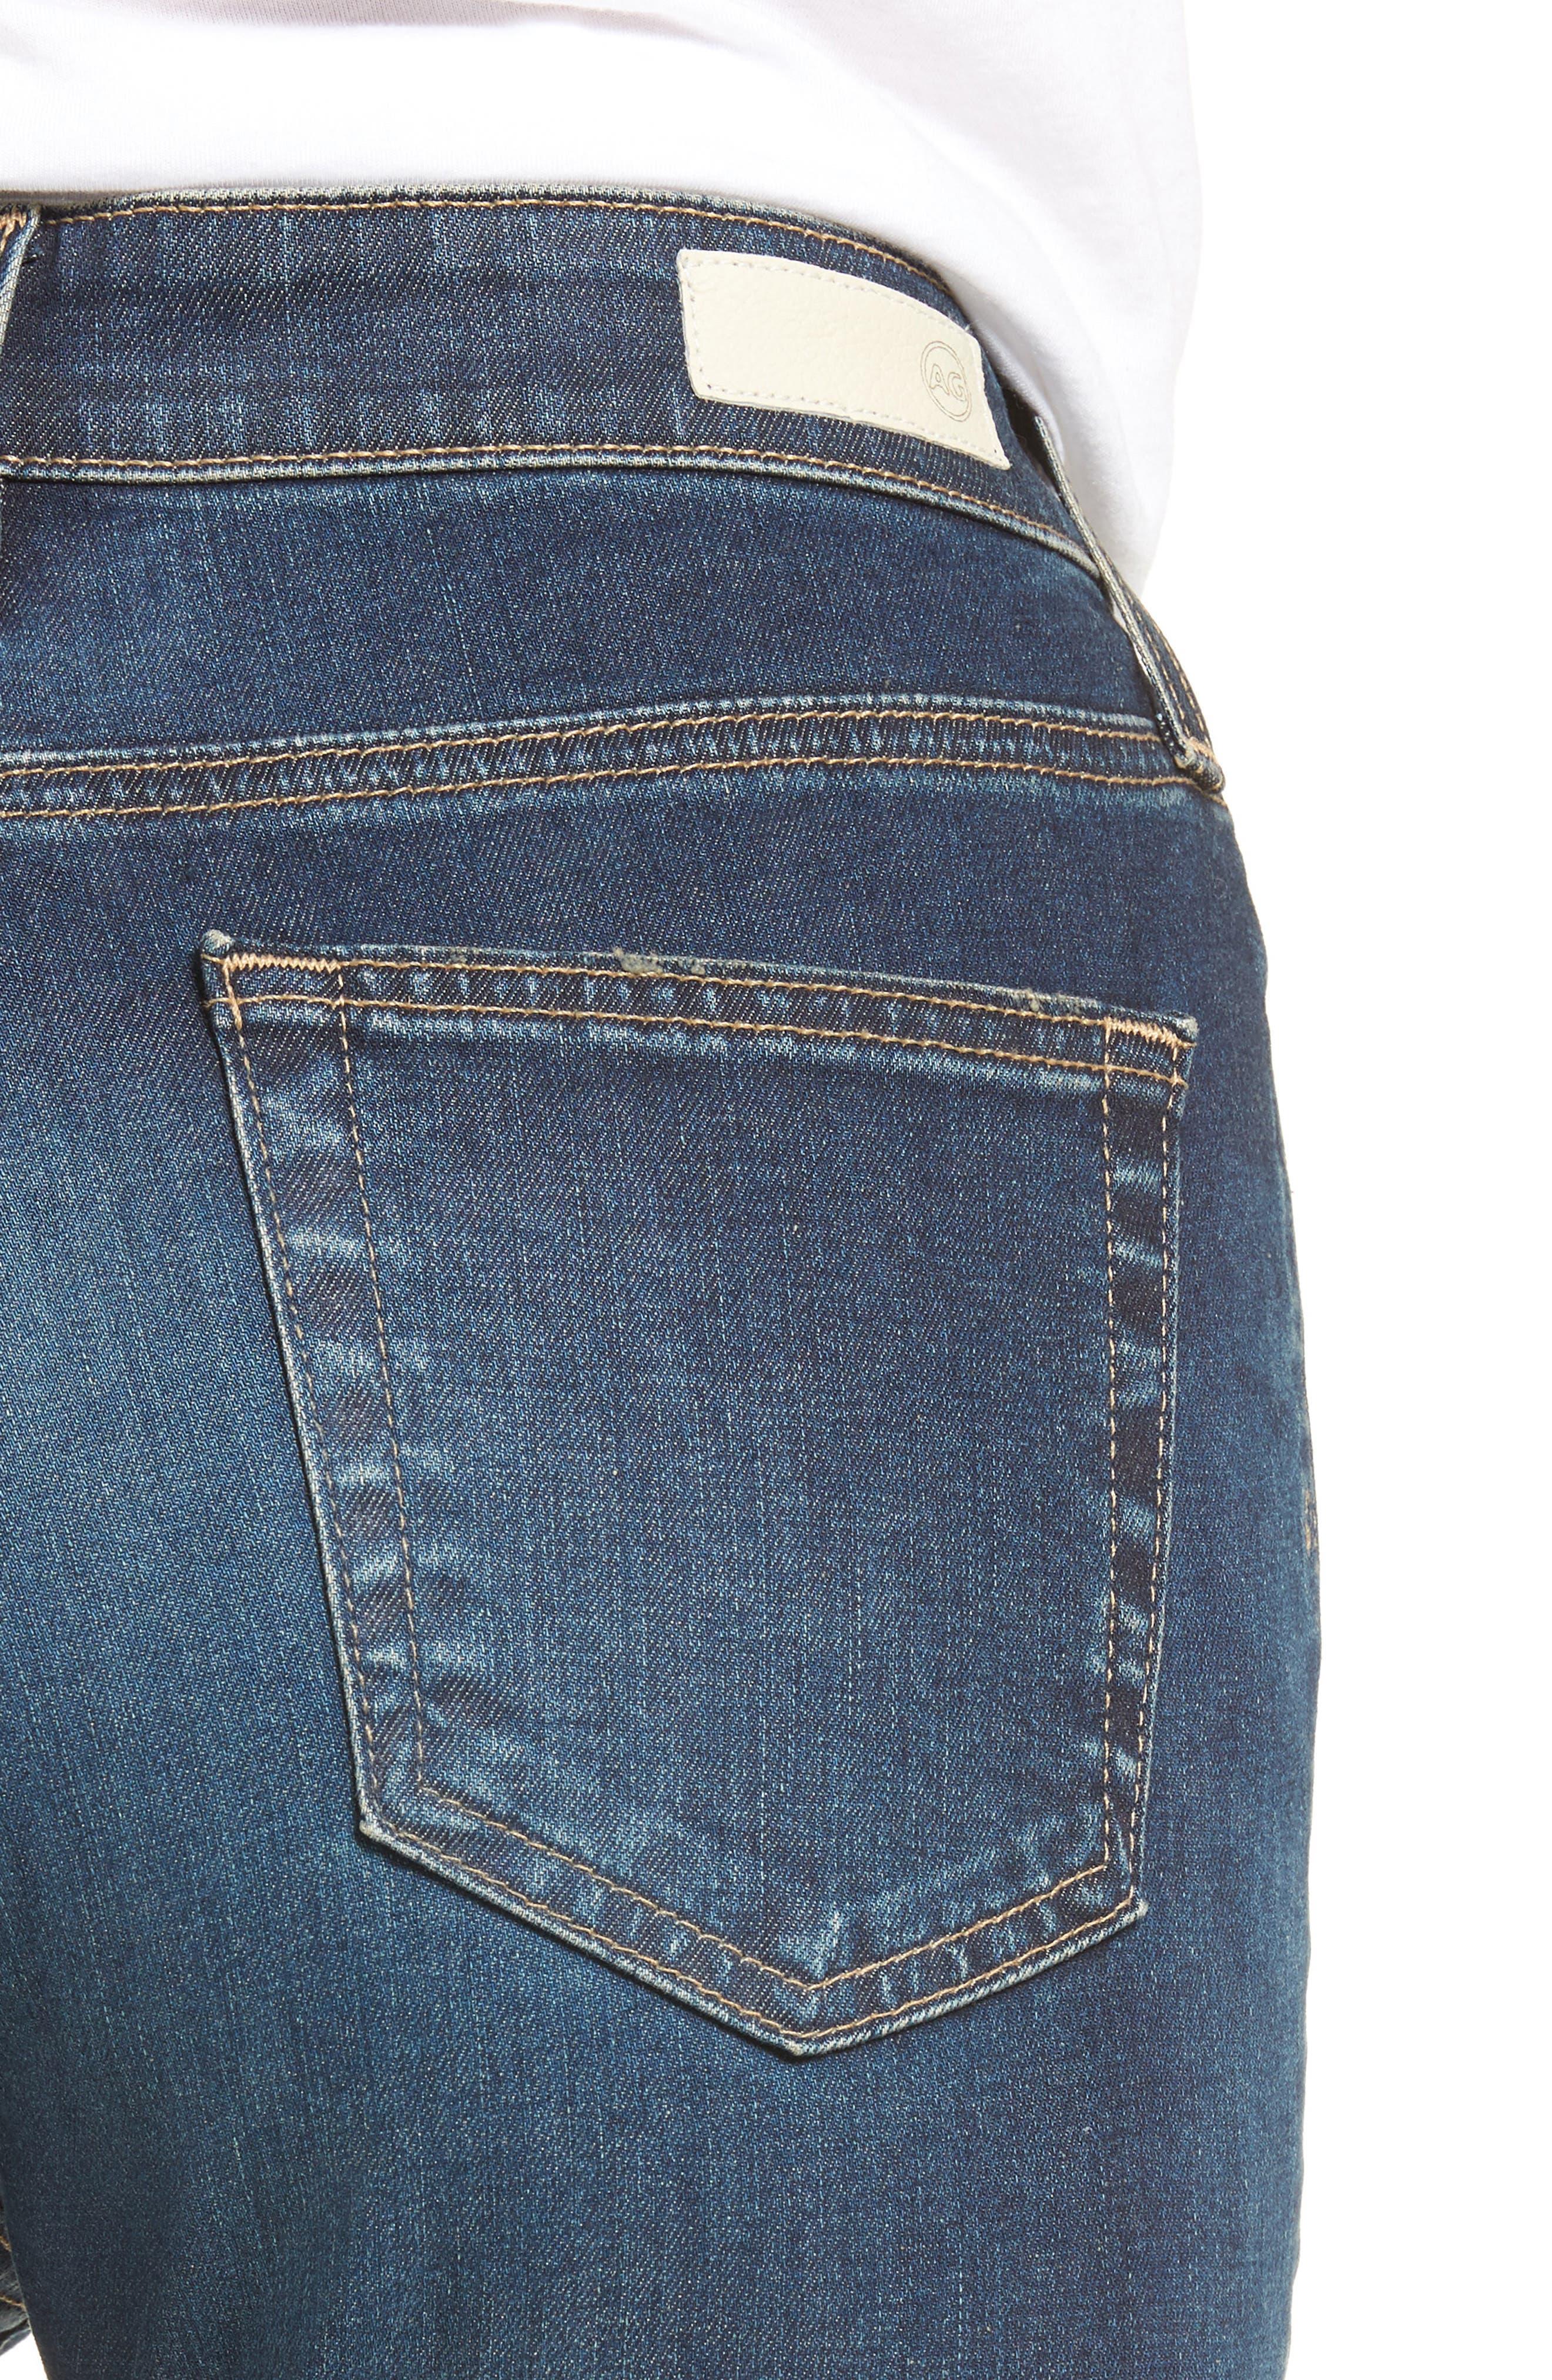 Alternate Image 4  - AG Mila High Rise Skinny Jeans (06 Years Songbird)